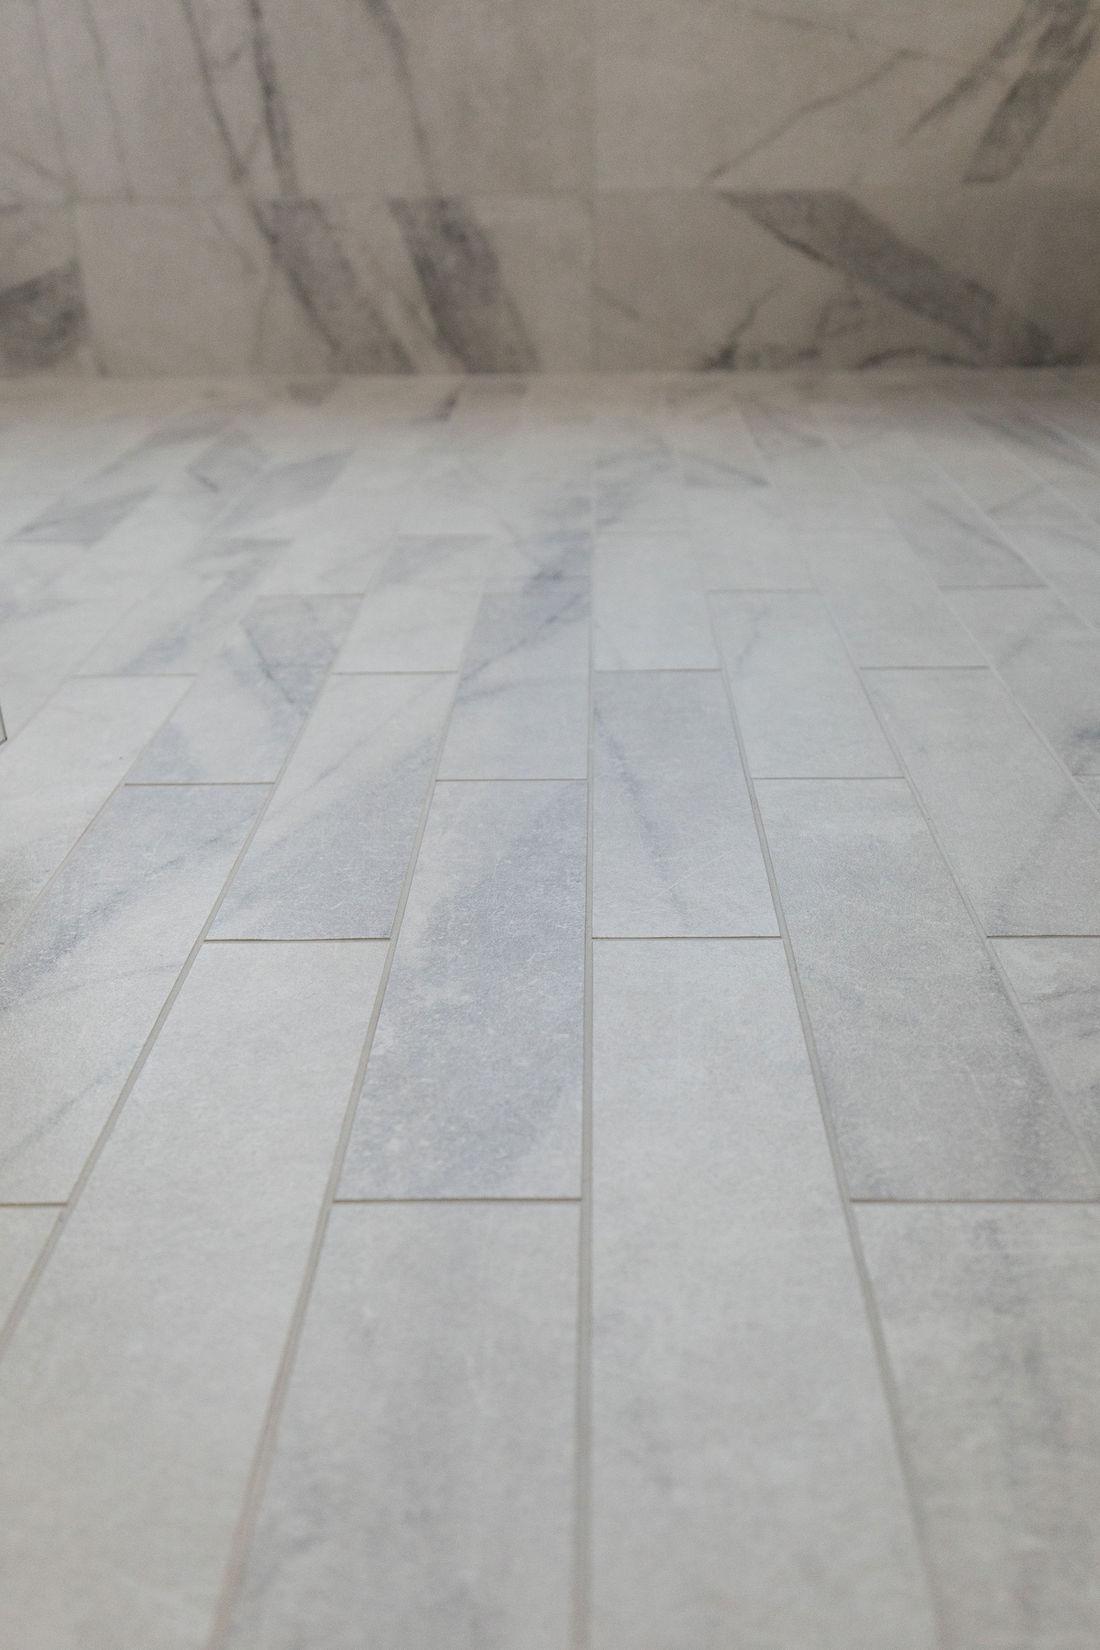 Marble-look bathroom subway tile floor